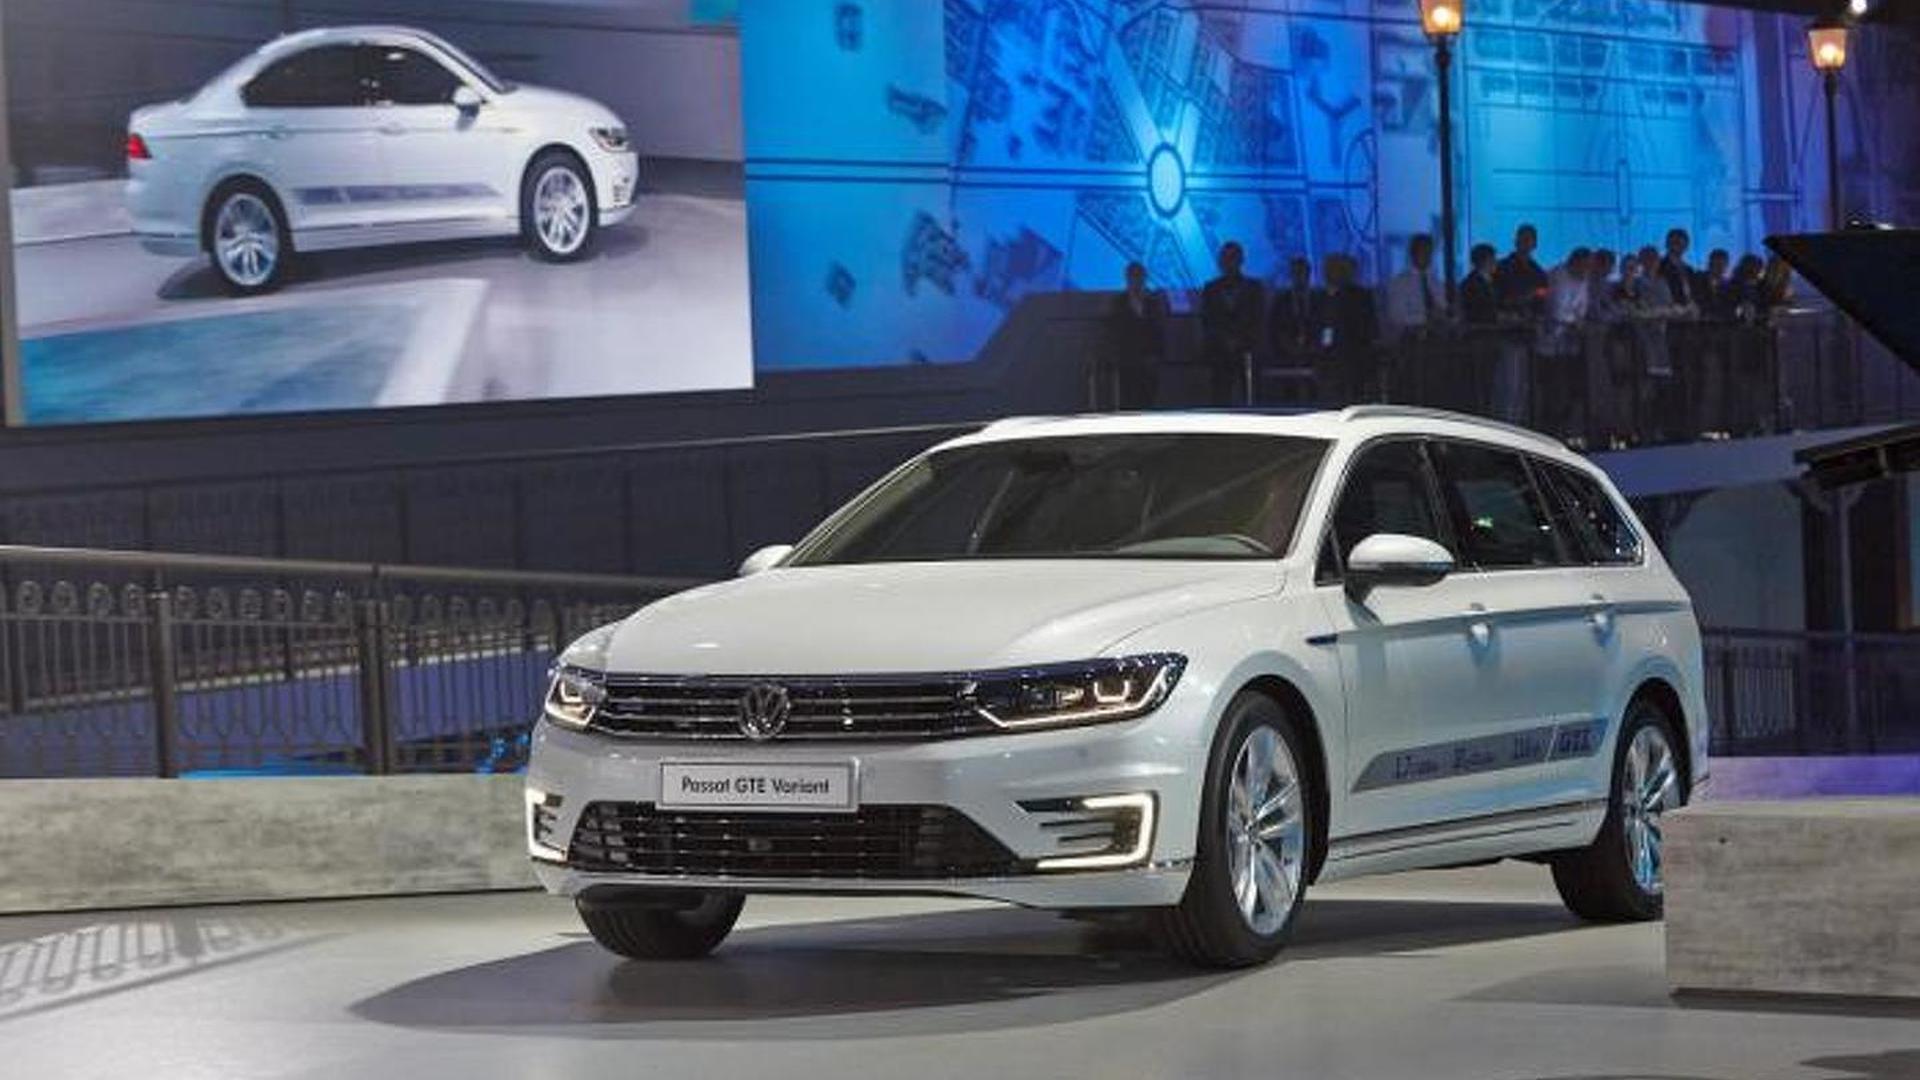 2015 Volkswagen Passat comes in Paris together with GTE version